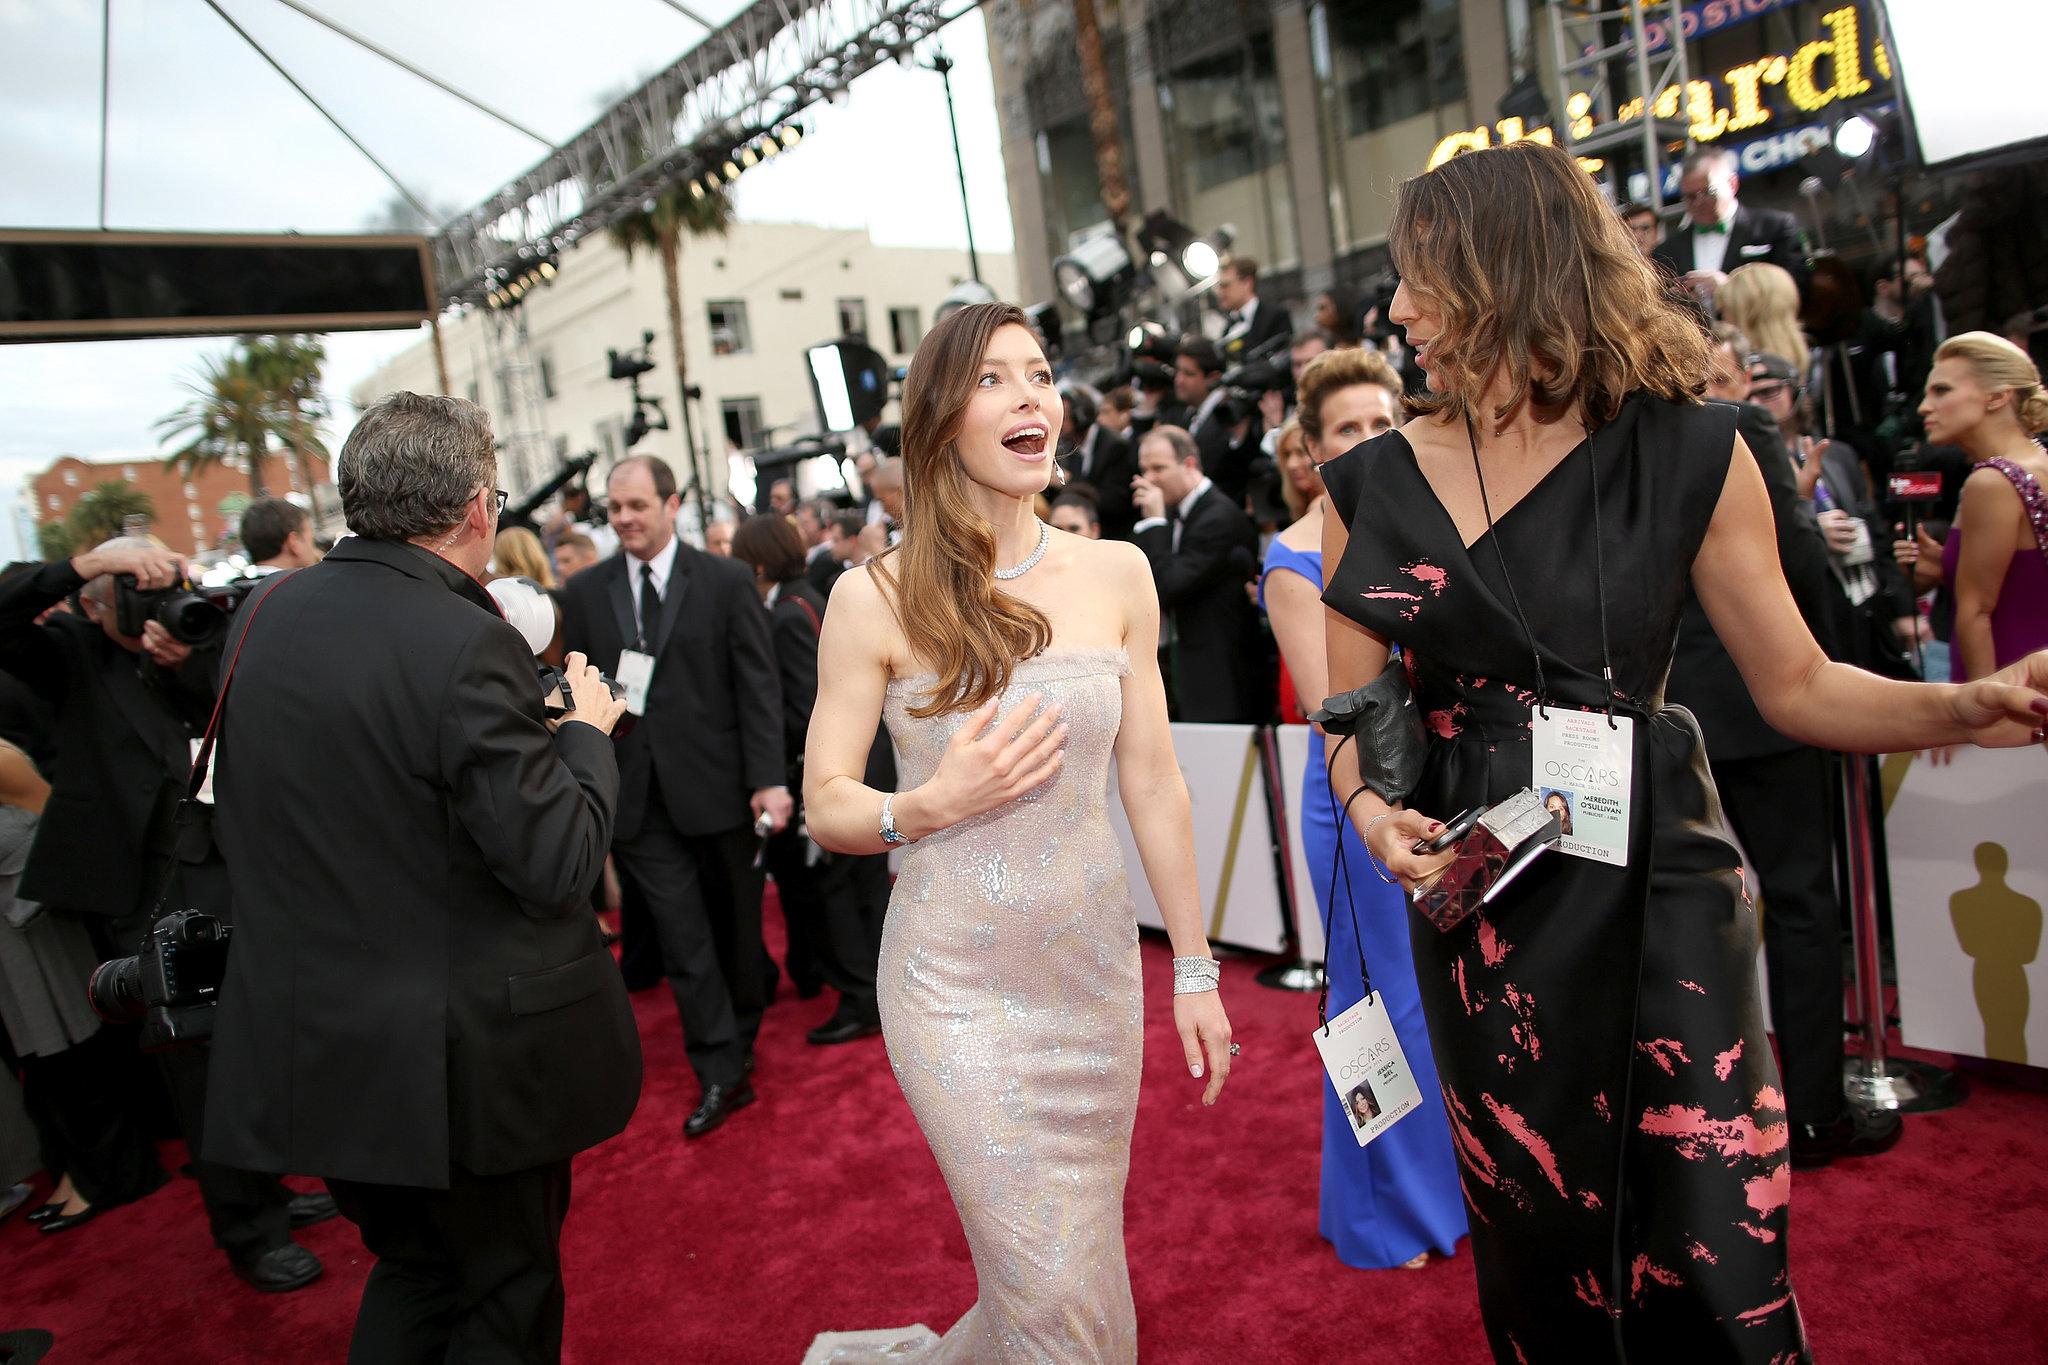 Jessica Biel at the 2014 Oscars.